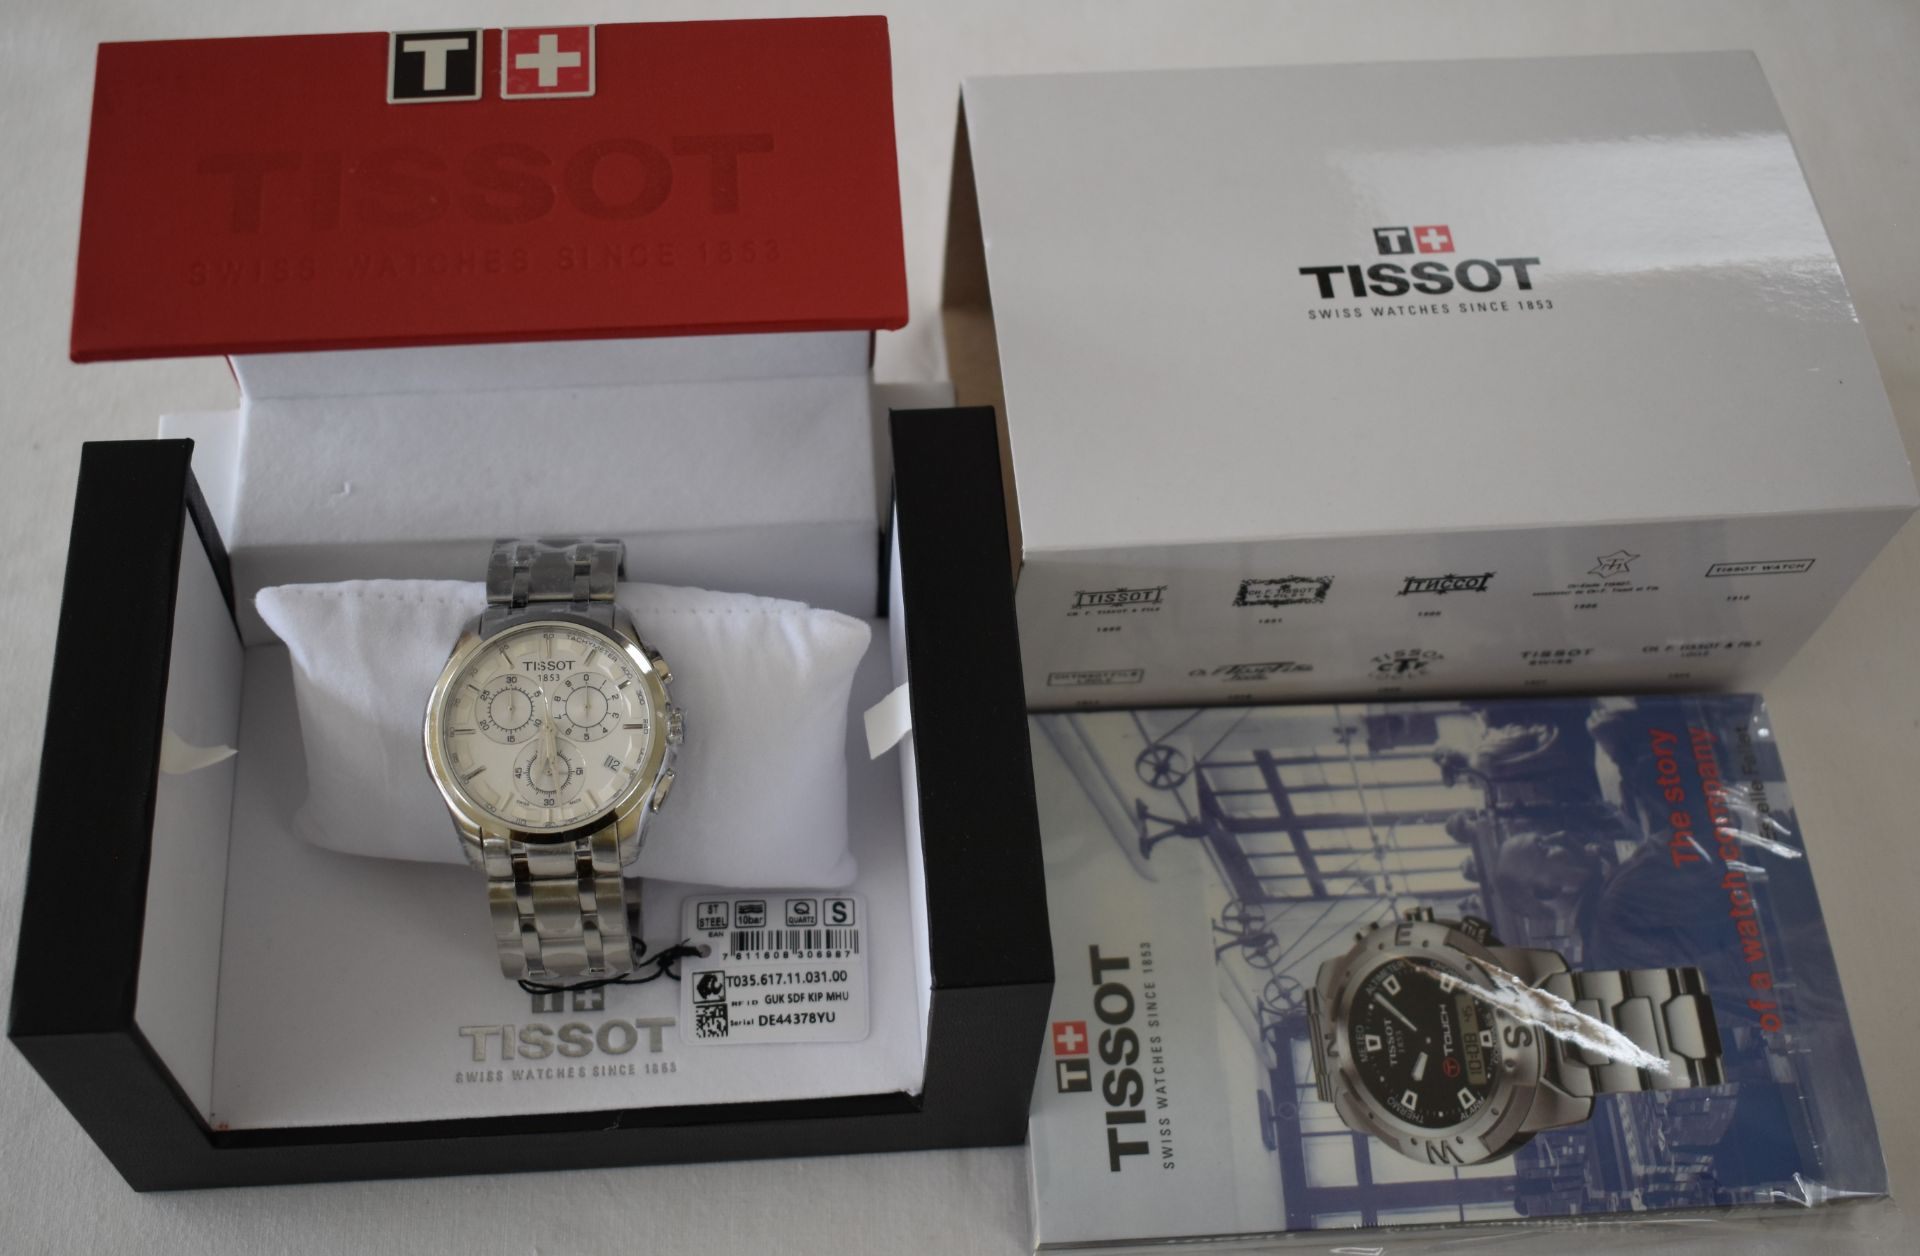 Tissot Men's Watch TO35.617.11.031.00 - Image 3 of 3